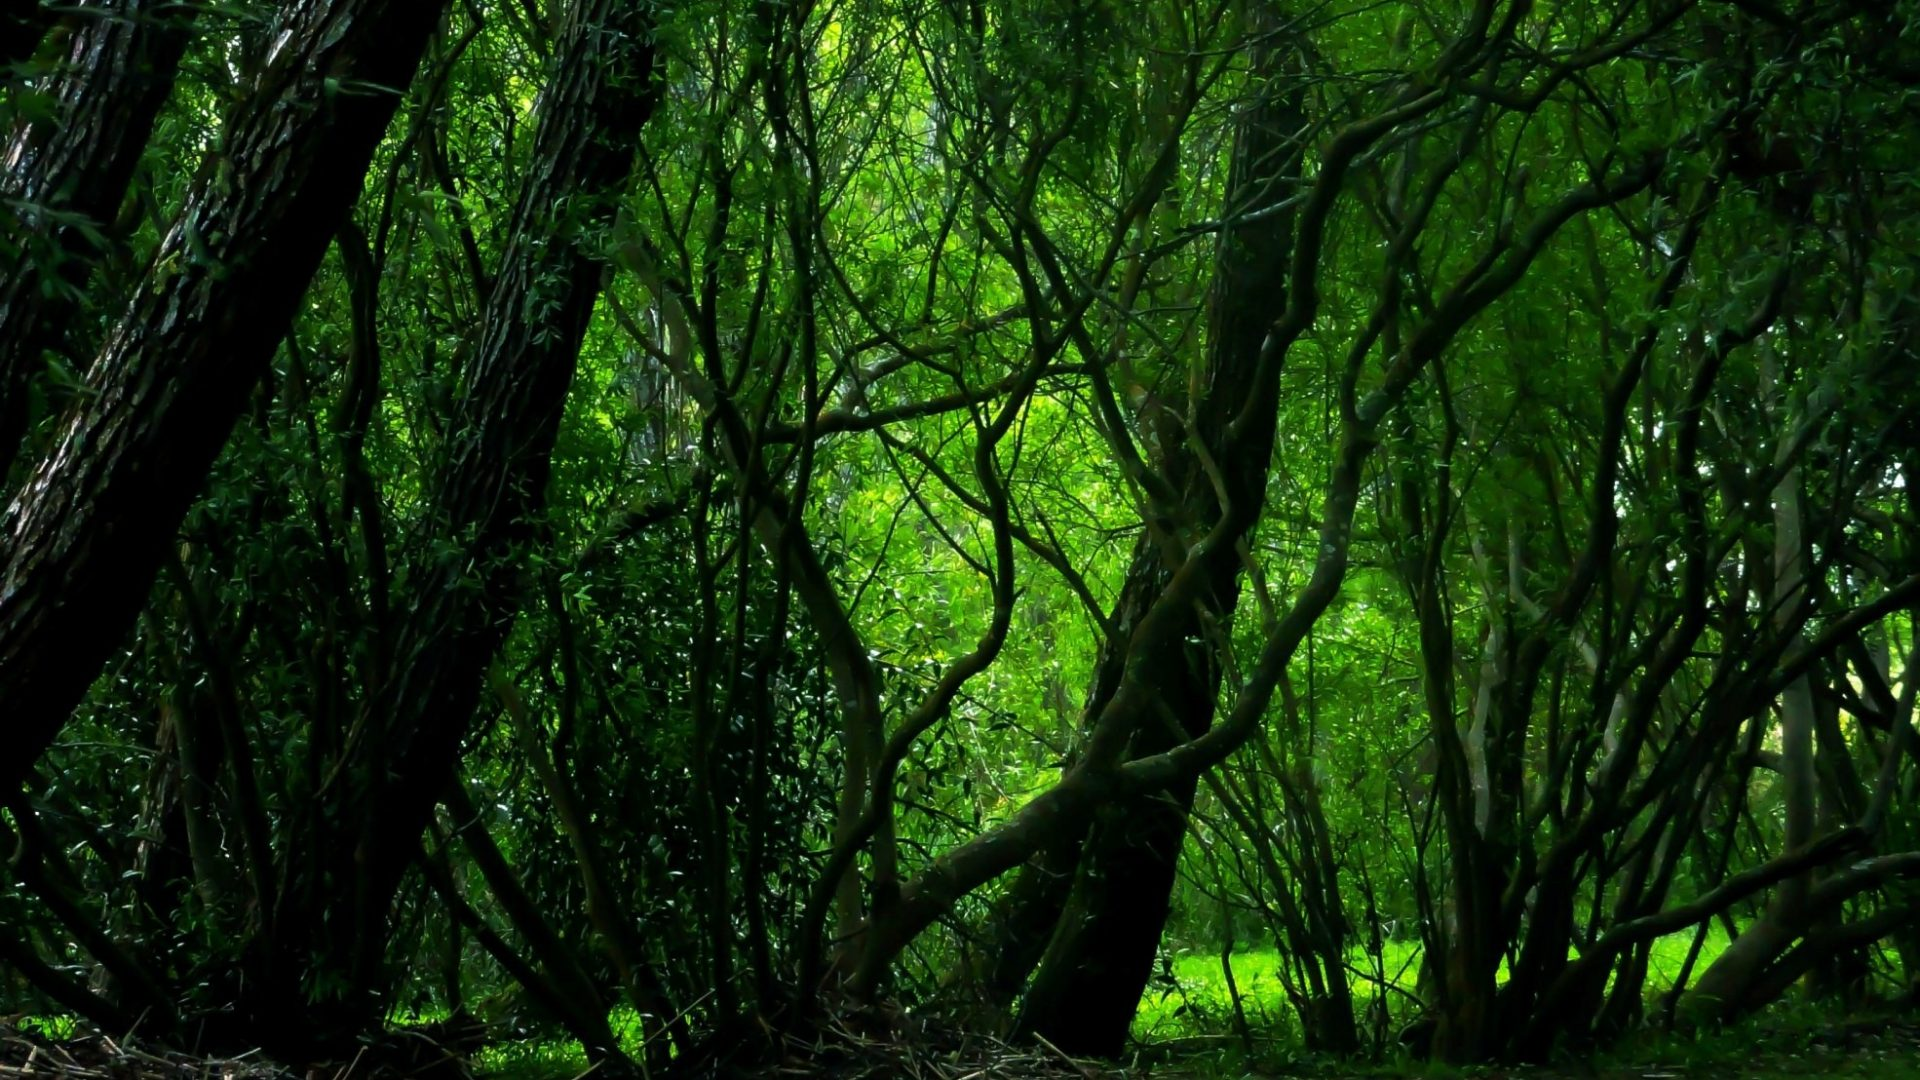 3d Forest Wallpaper Backgrounds Dark Woods Hd Backgrounds Pixelstalk Net